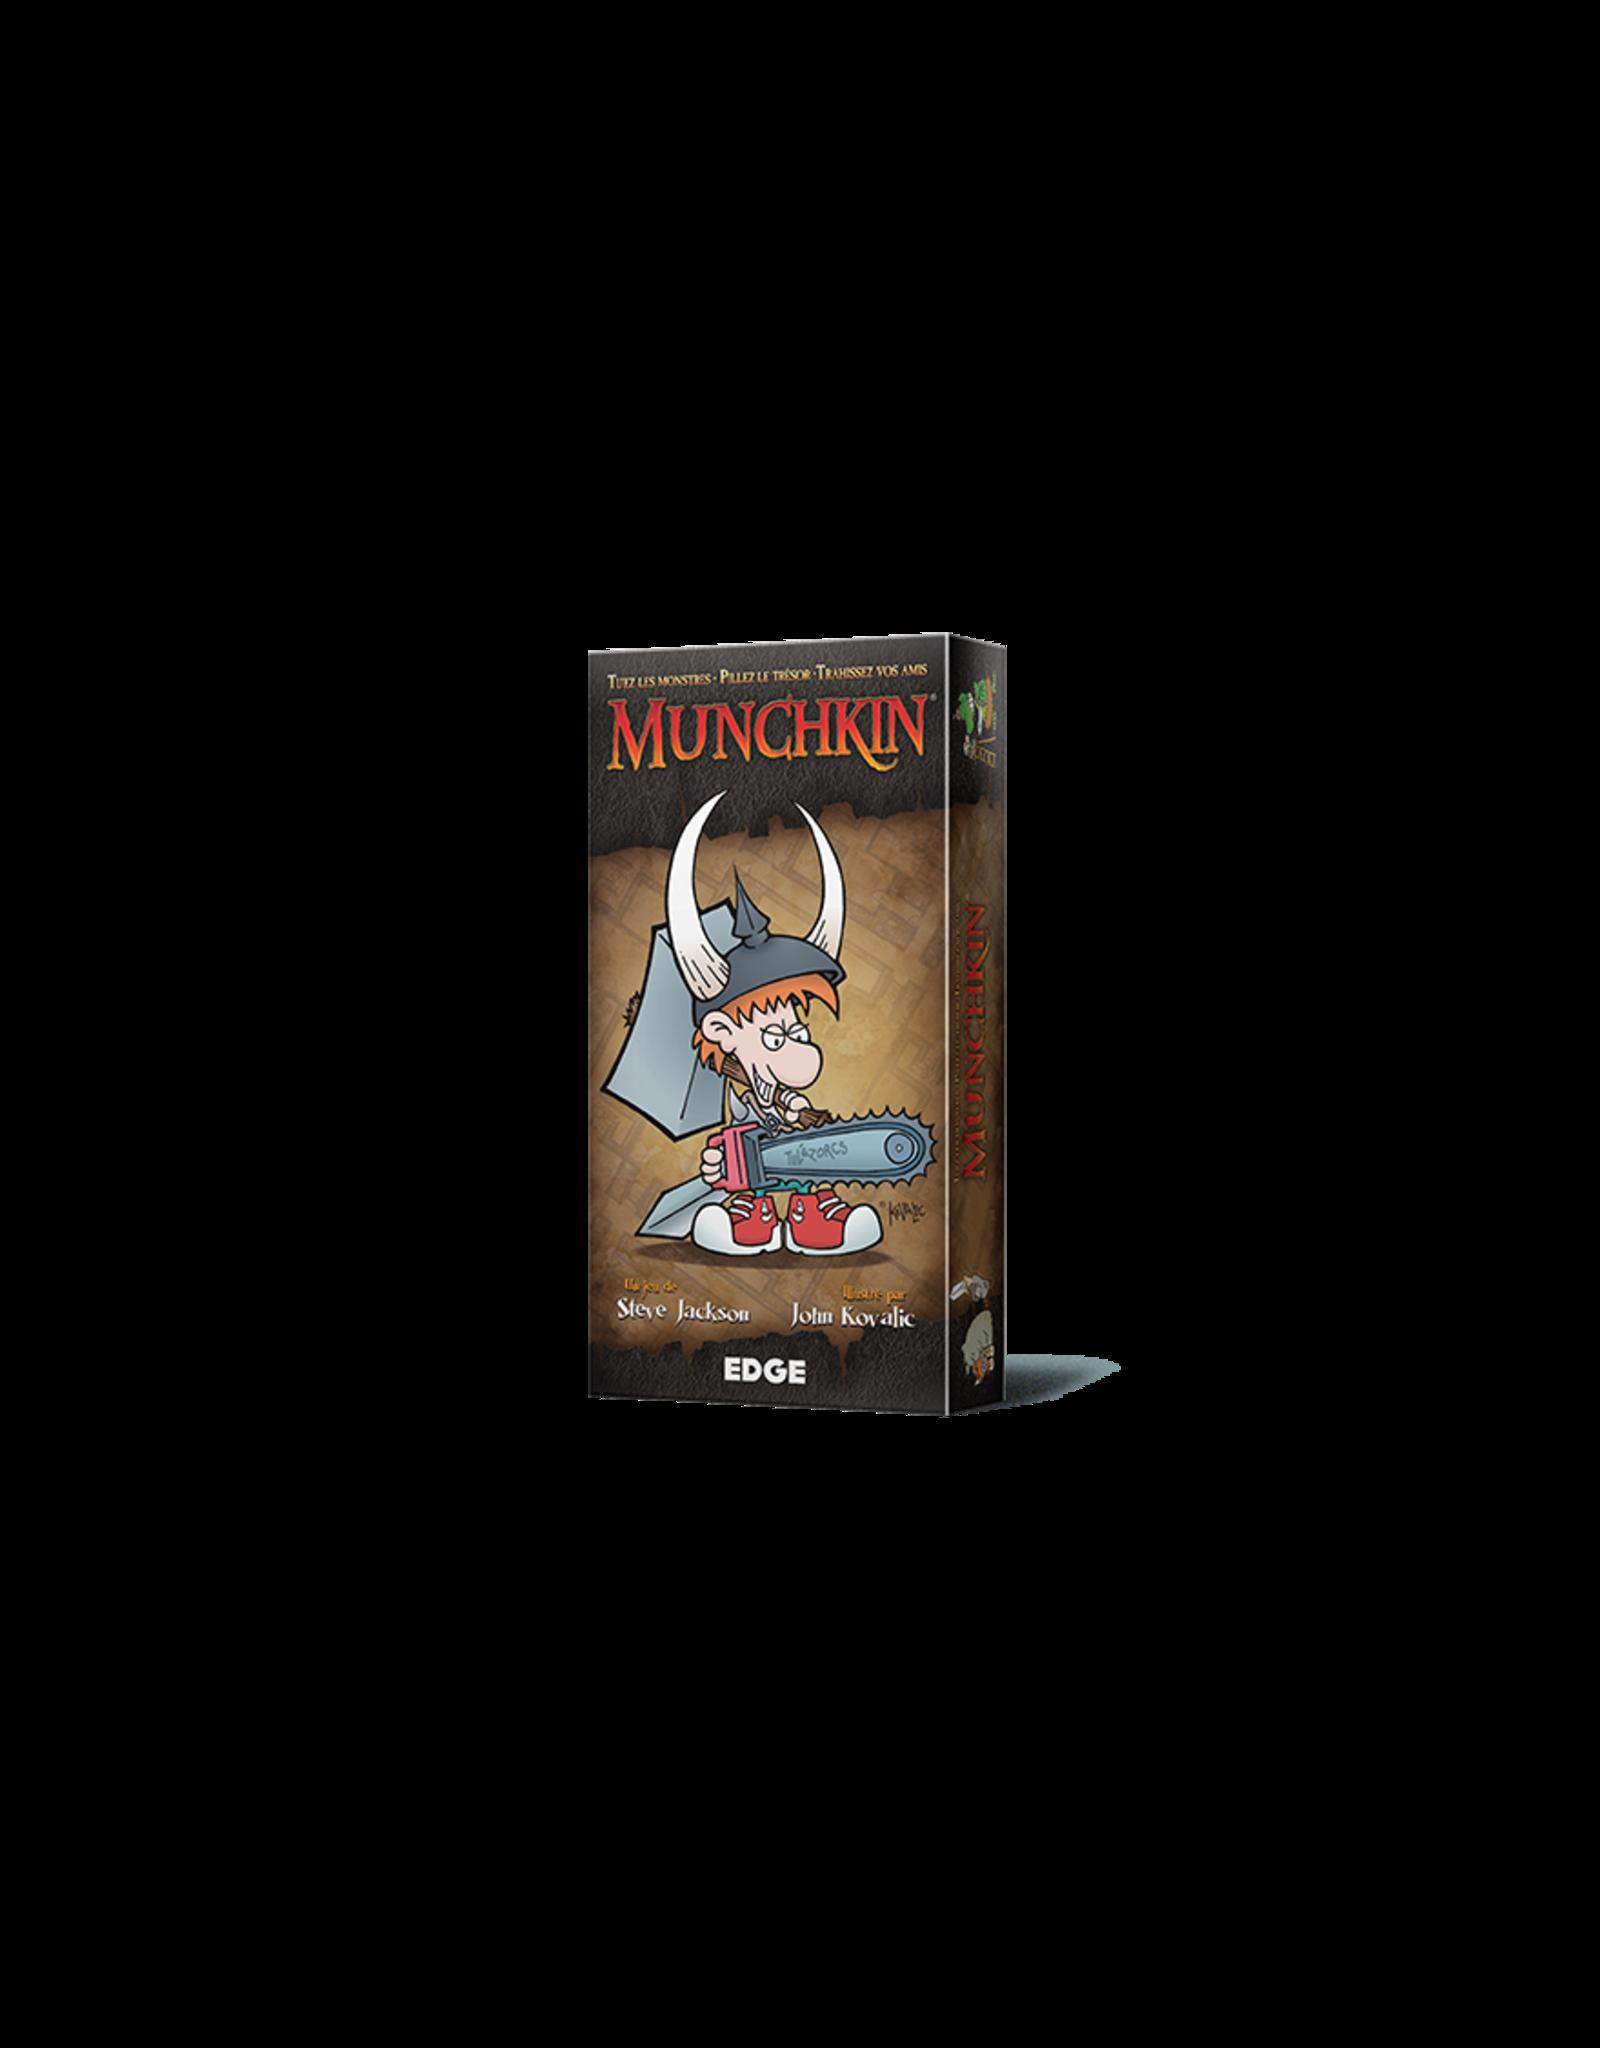 EDGE MUNCHKIN SECONDE EDITION